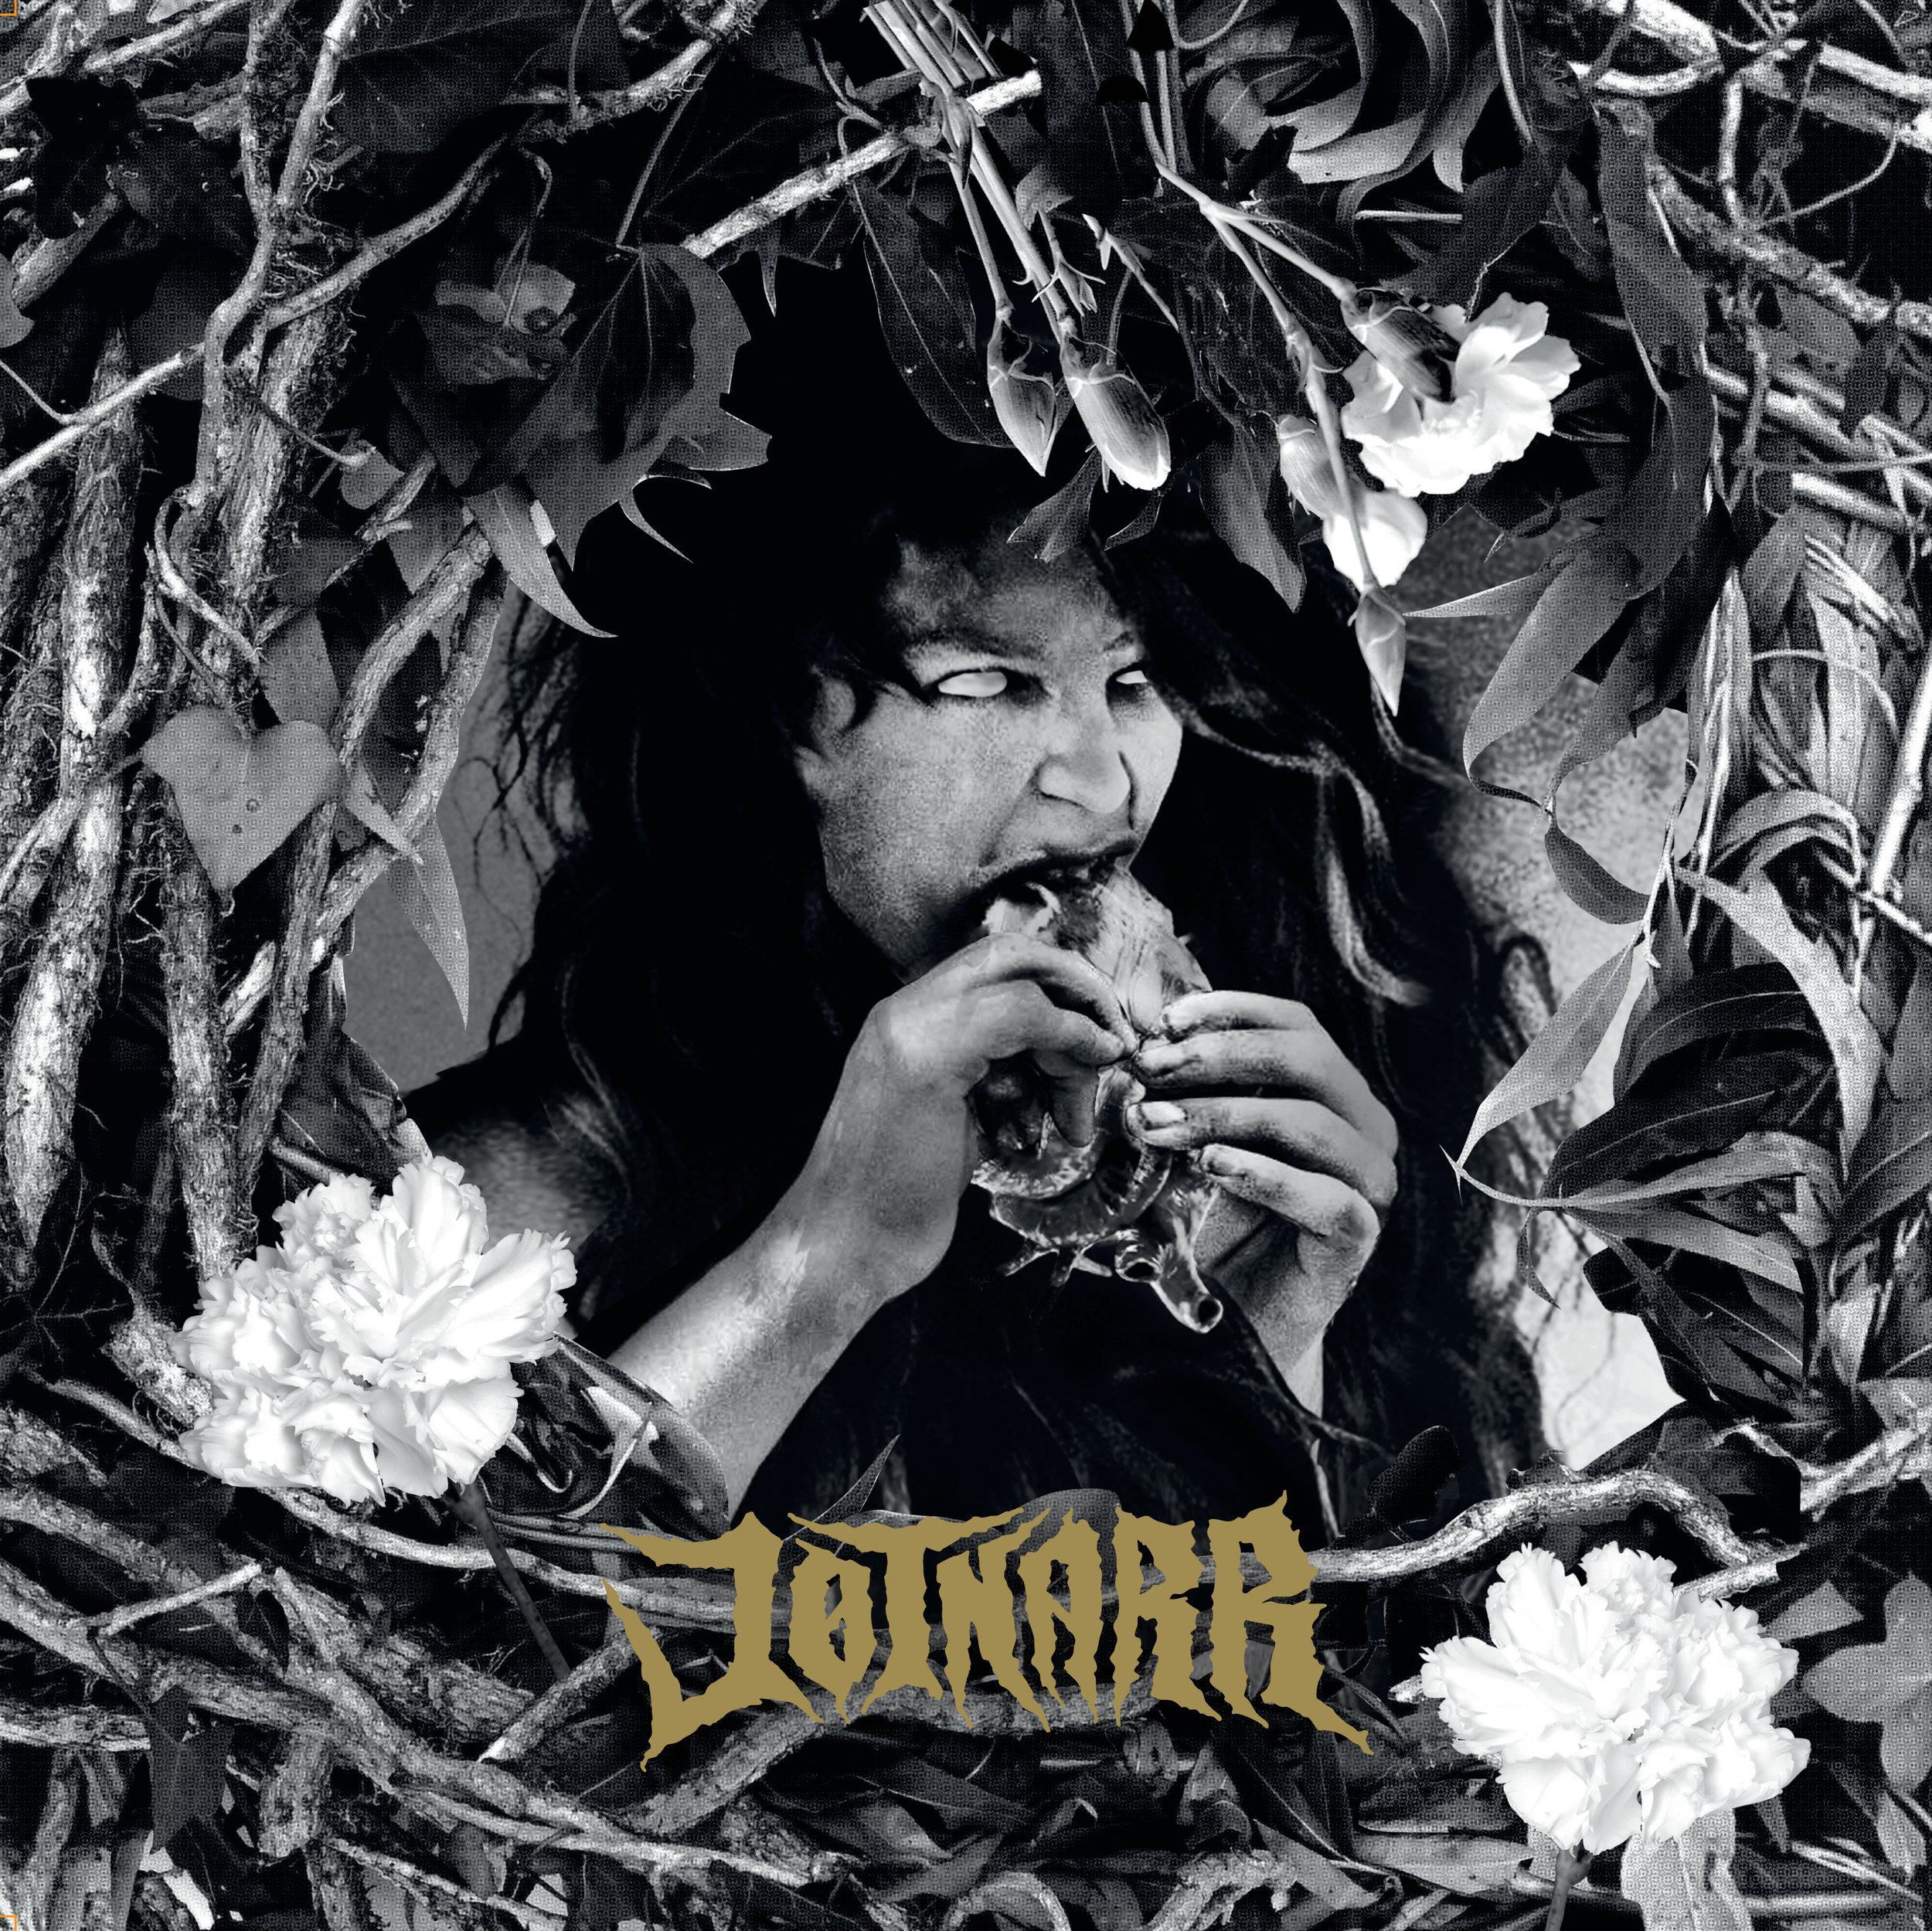 Jotnarr - s/t LP - $12